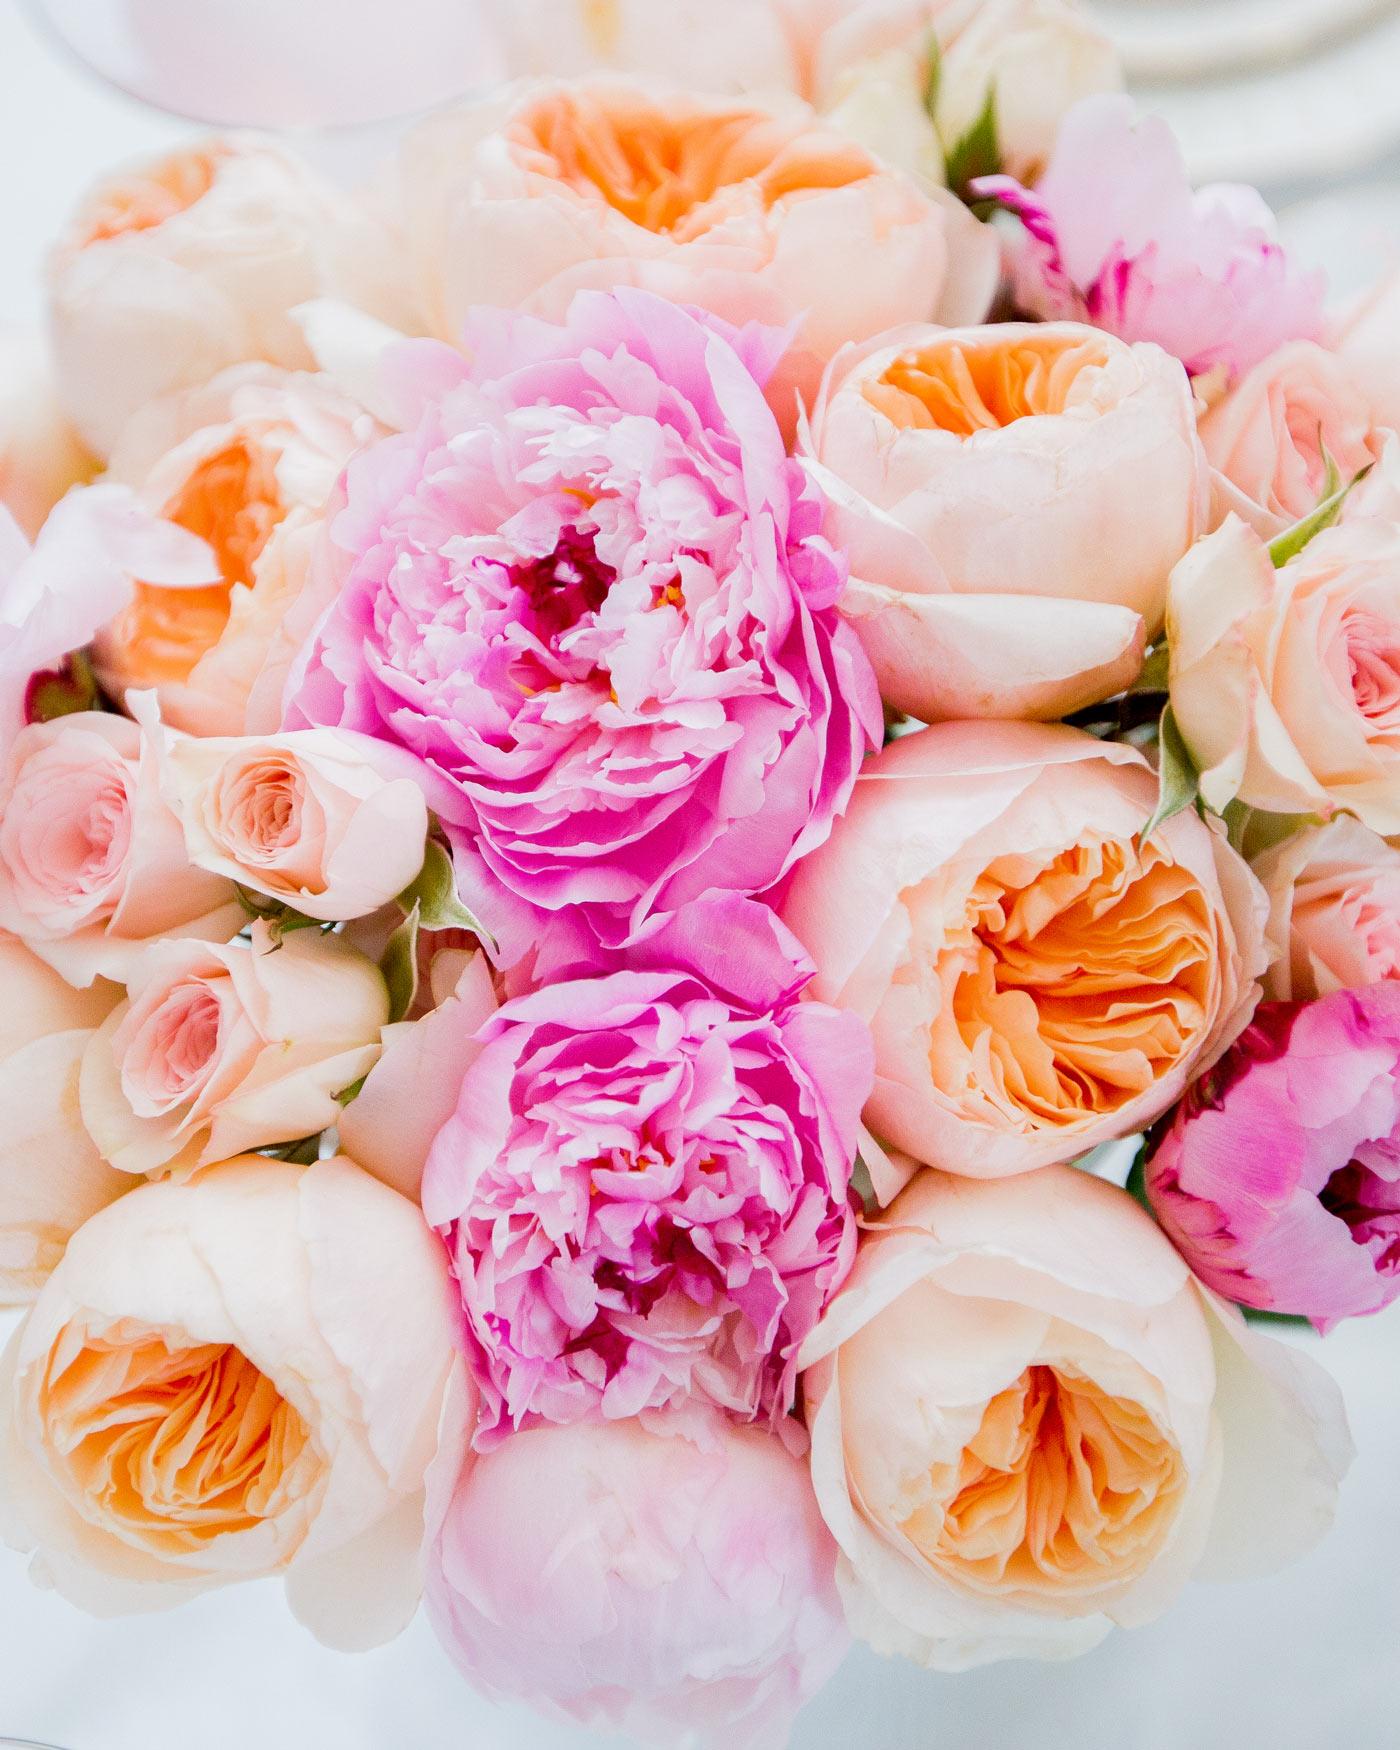 fashionable-hostess-bridal-shower-roses-0416.jpg